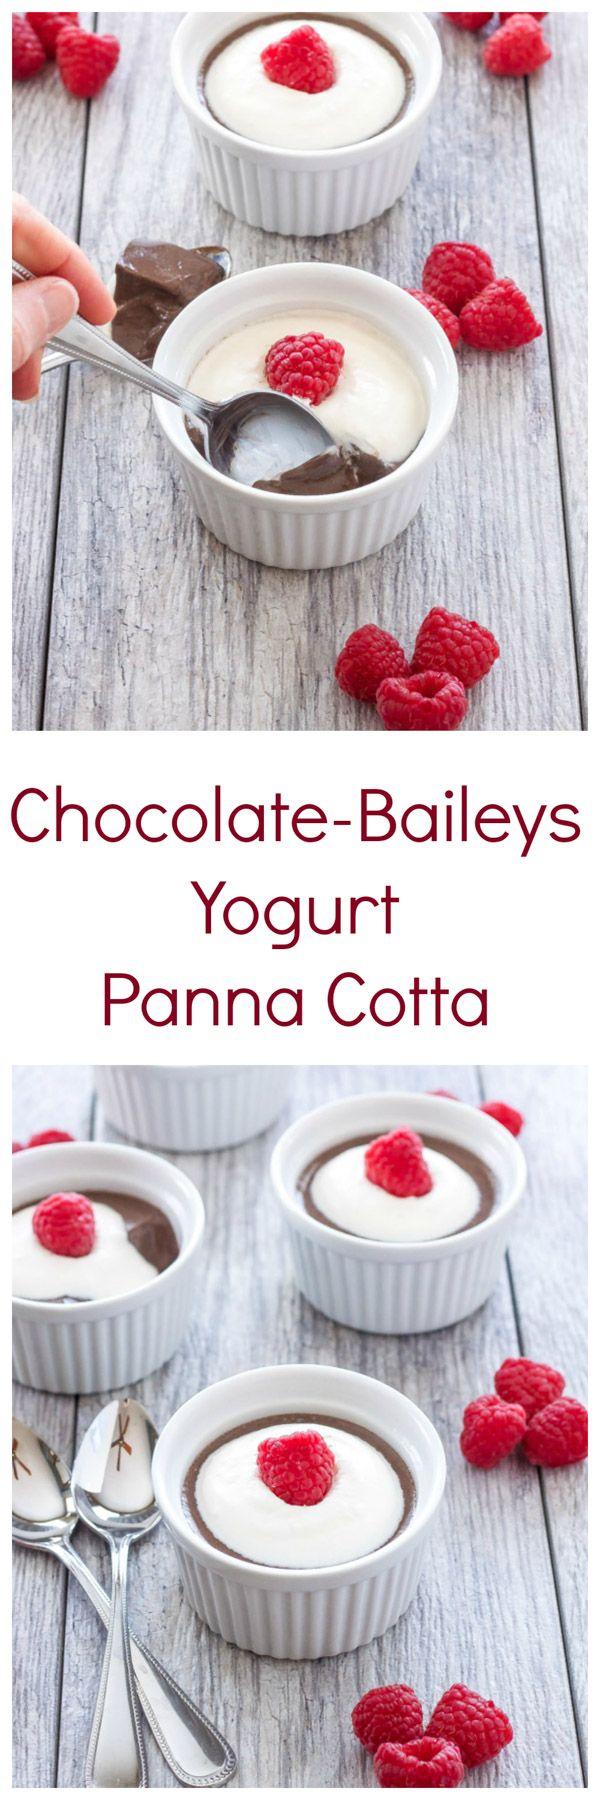 Chocolate-Baileys Yogurt Panna Cotta   Chocolate panna cotta spiked with Baileys Irish cream!   @reciperunner